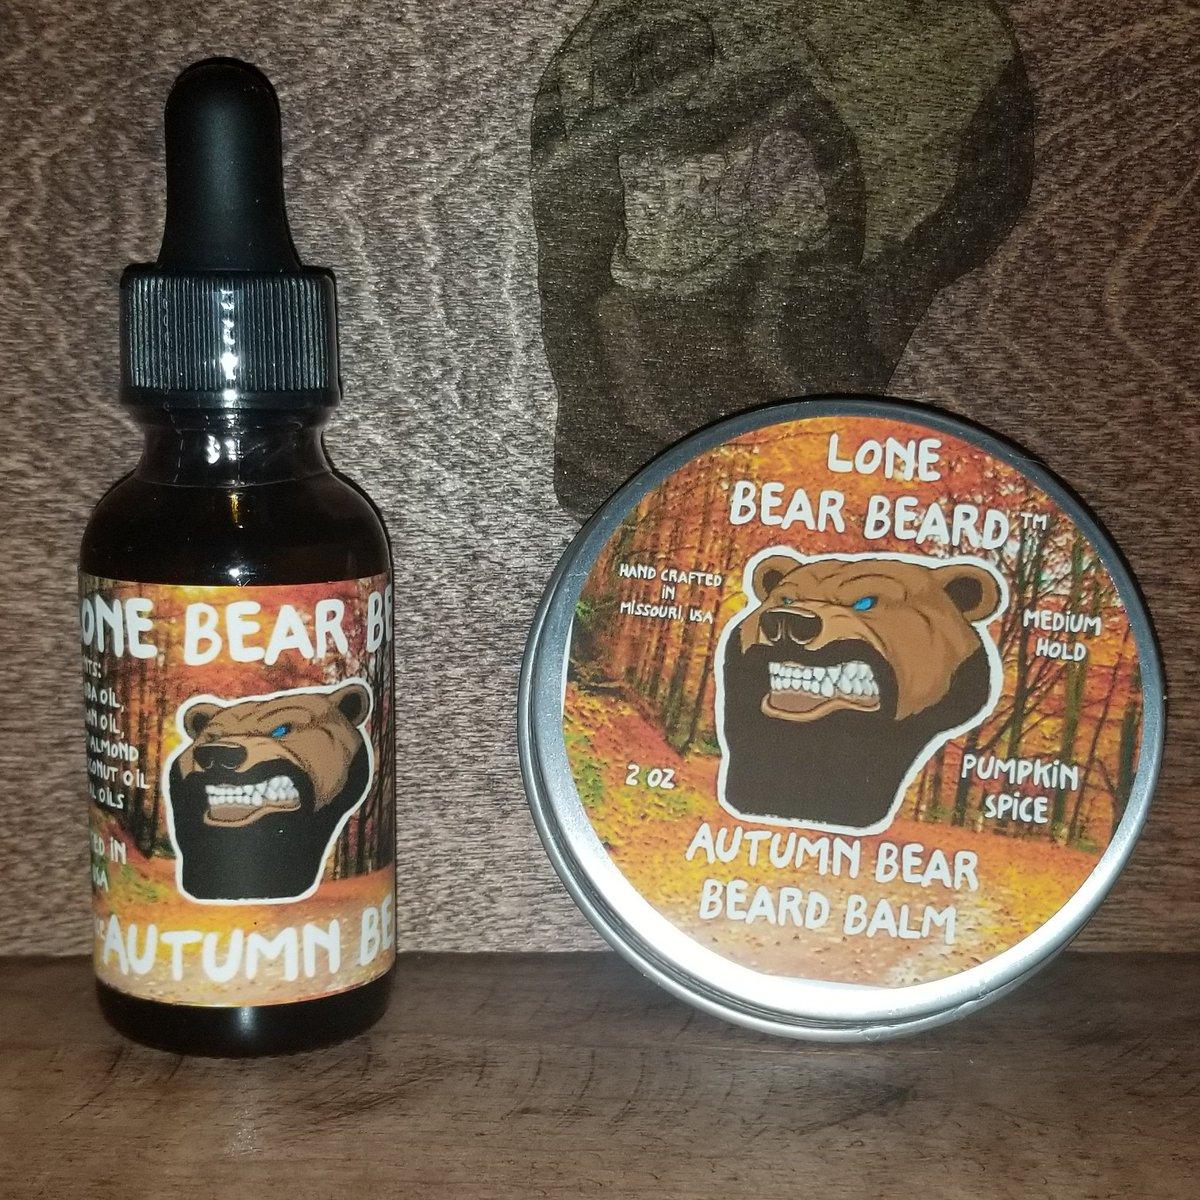 Our Autumn Bear #PumpkinSpice scent is live on our website. #LoneBearBeard #LiveBearded #Beard #Beardos #NoShaveEver #BeAMan #WomenLoveIt #BeardedLife #nicebeard #beardfamily #familybeards #merica #fall #beardoil #BeardGang #beardbalm #beardset #bearded #beardedmanpic.twitter.com/1ZrSC5F1mA